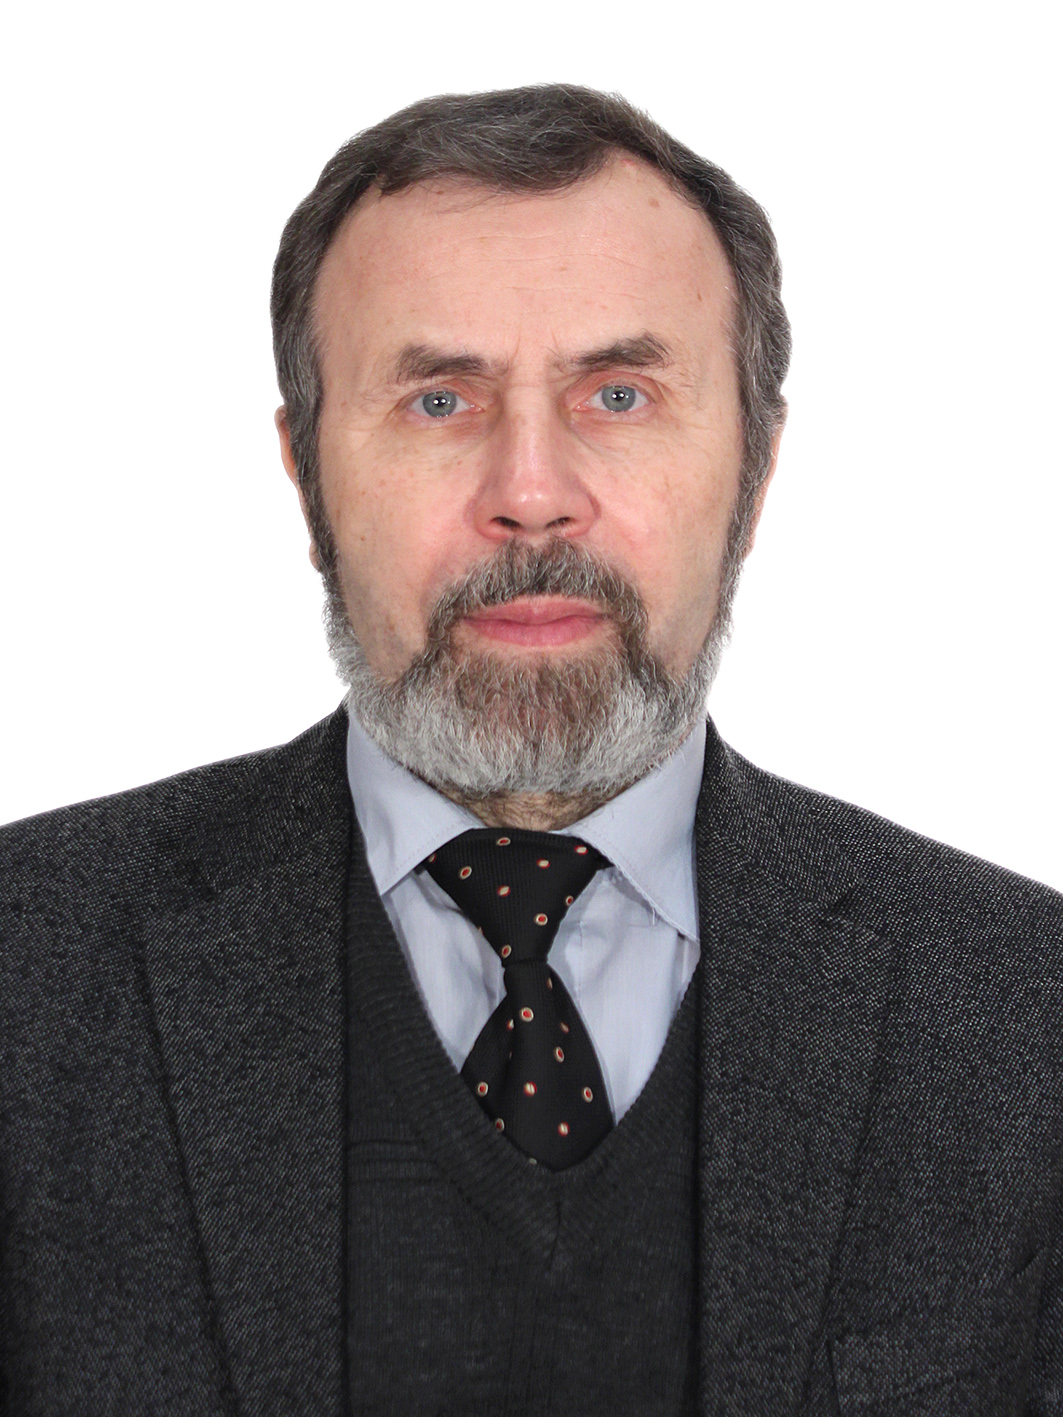 Viacheslav Samarin's home page